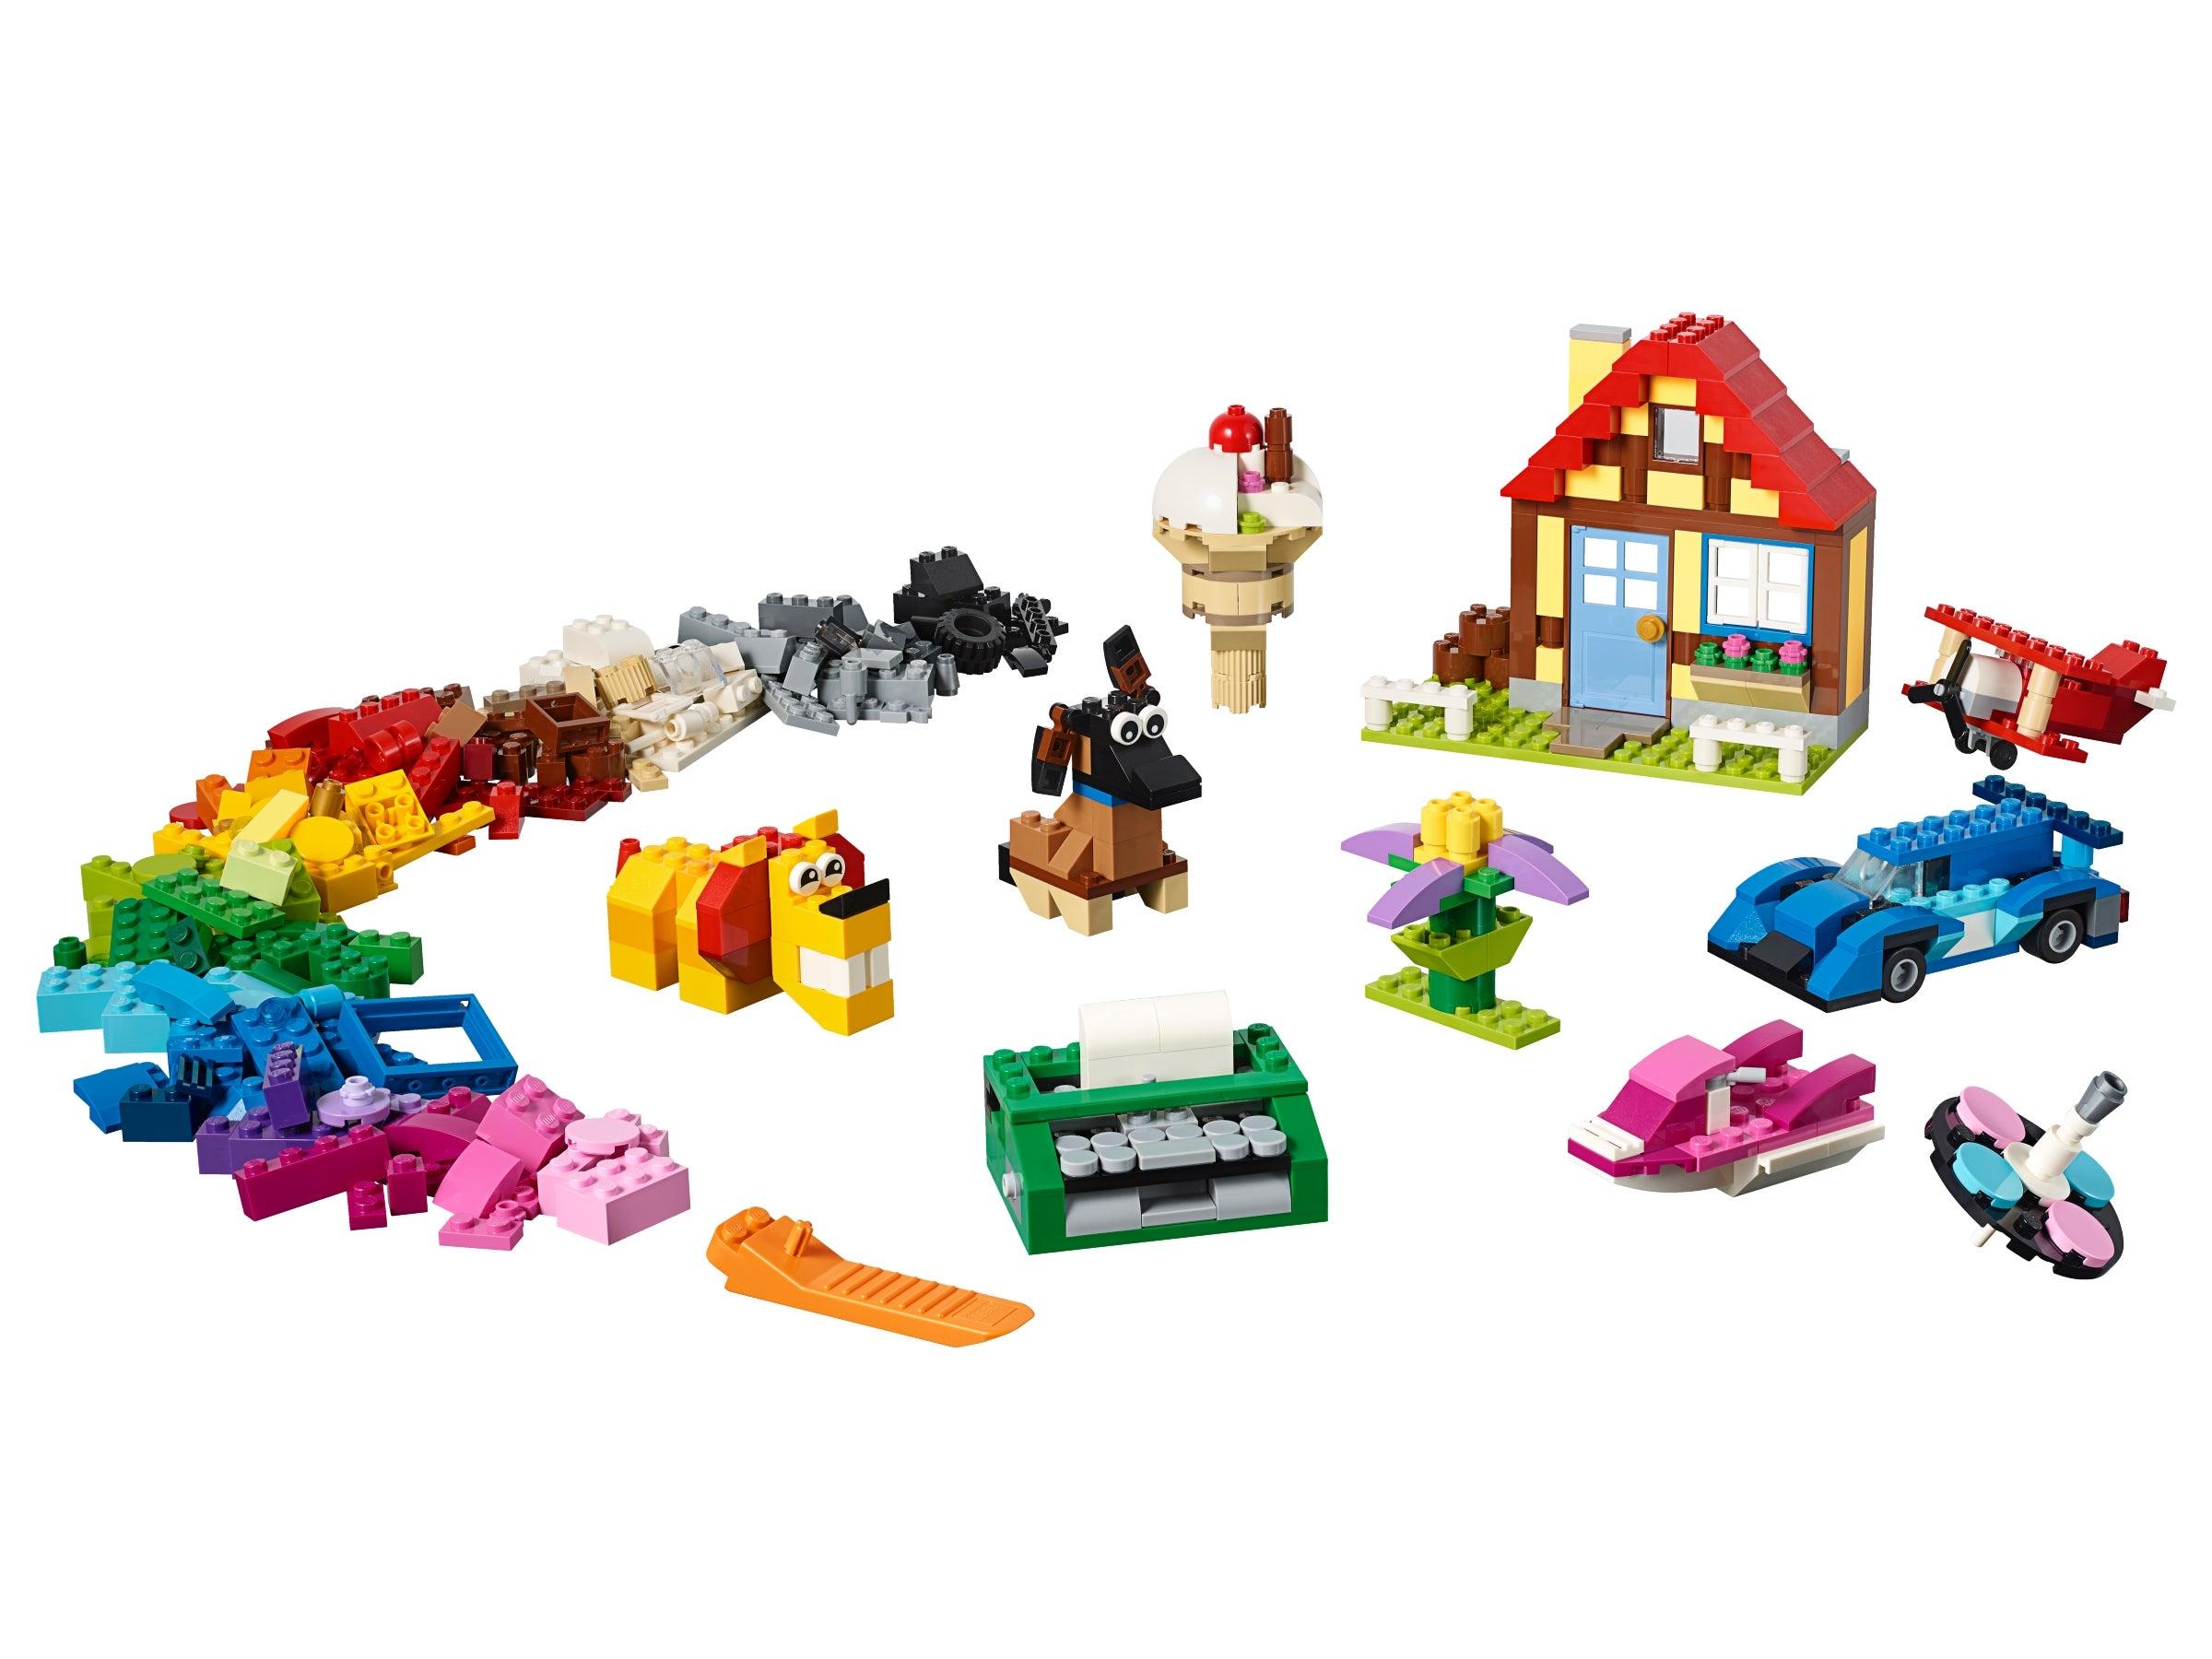 Lego 11005 Kit De Construcción Clásico diversión creativa